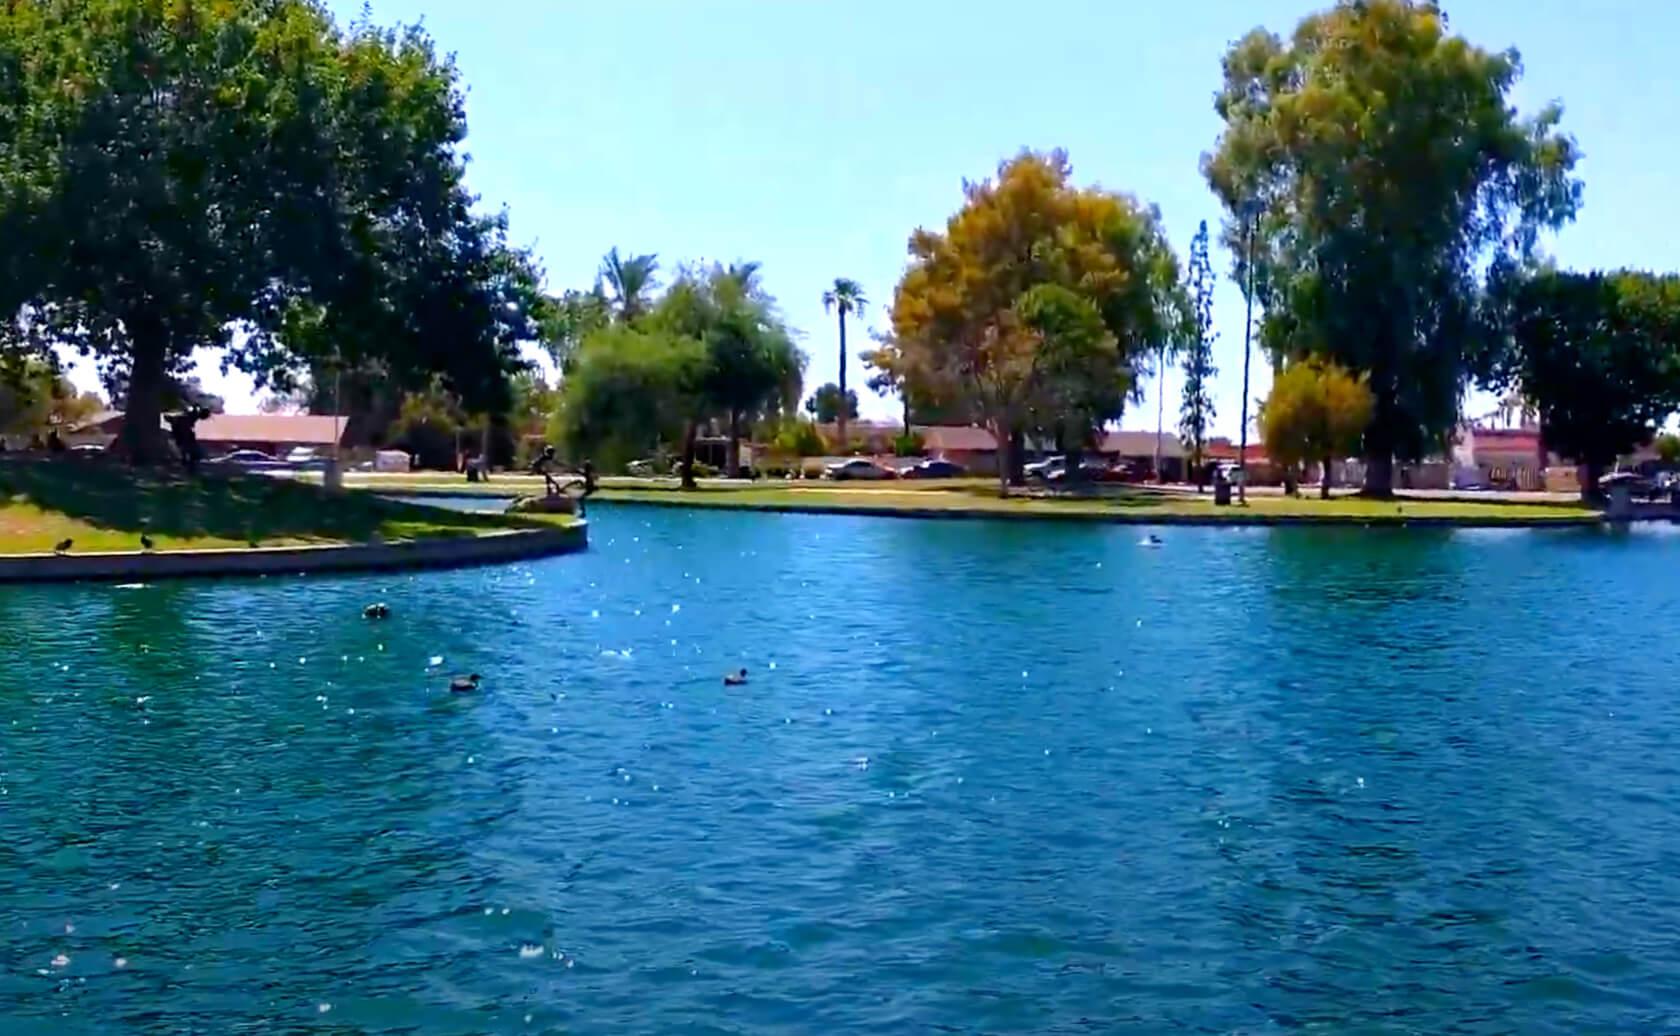 Bonsall-Pond-Lake-Fishing-Guide-Report-Glendale-AZ-05